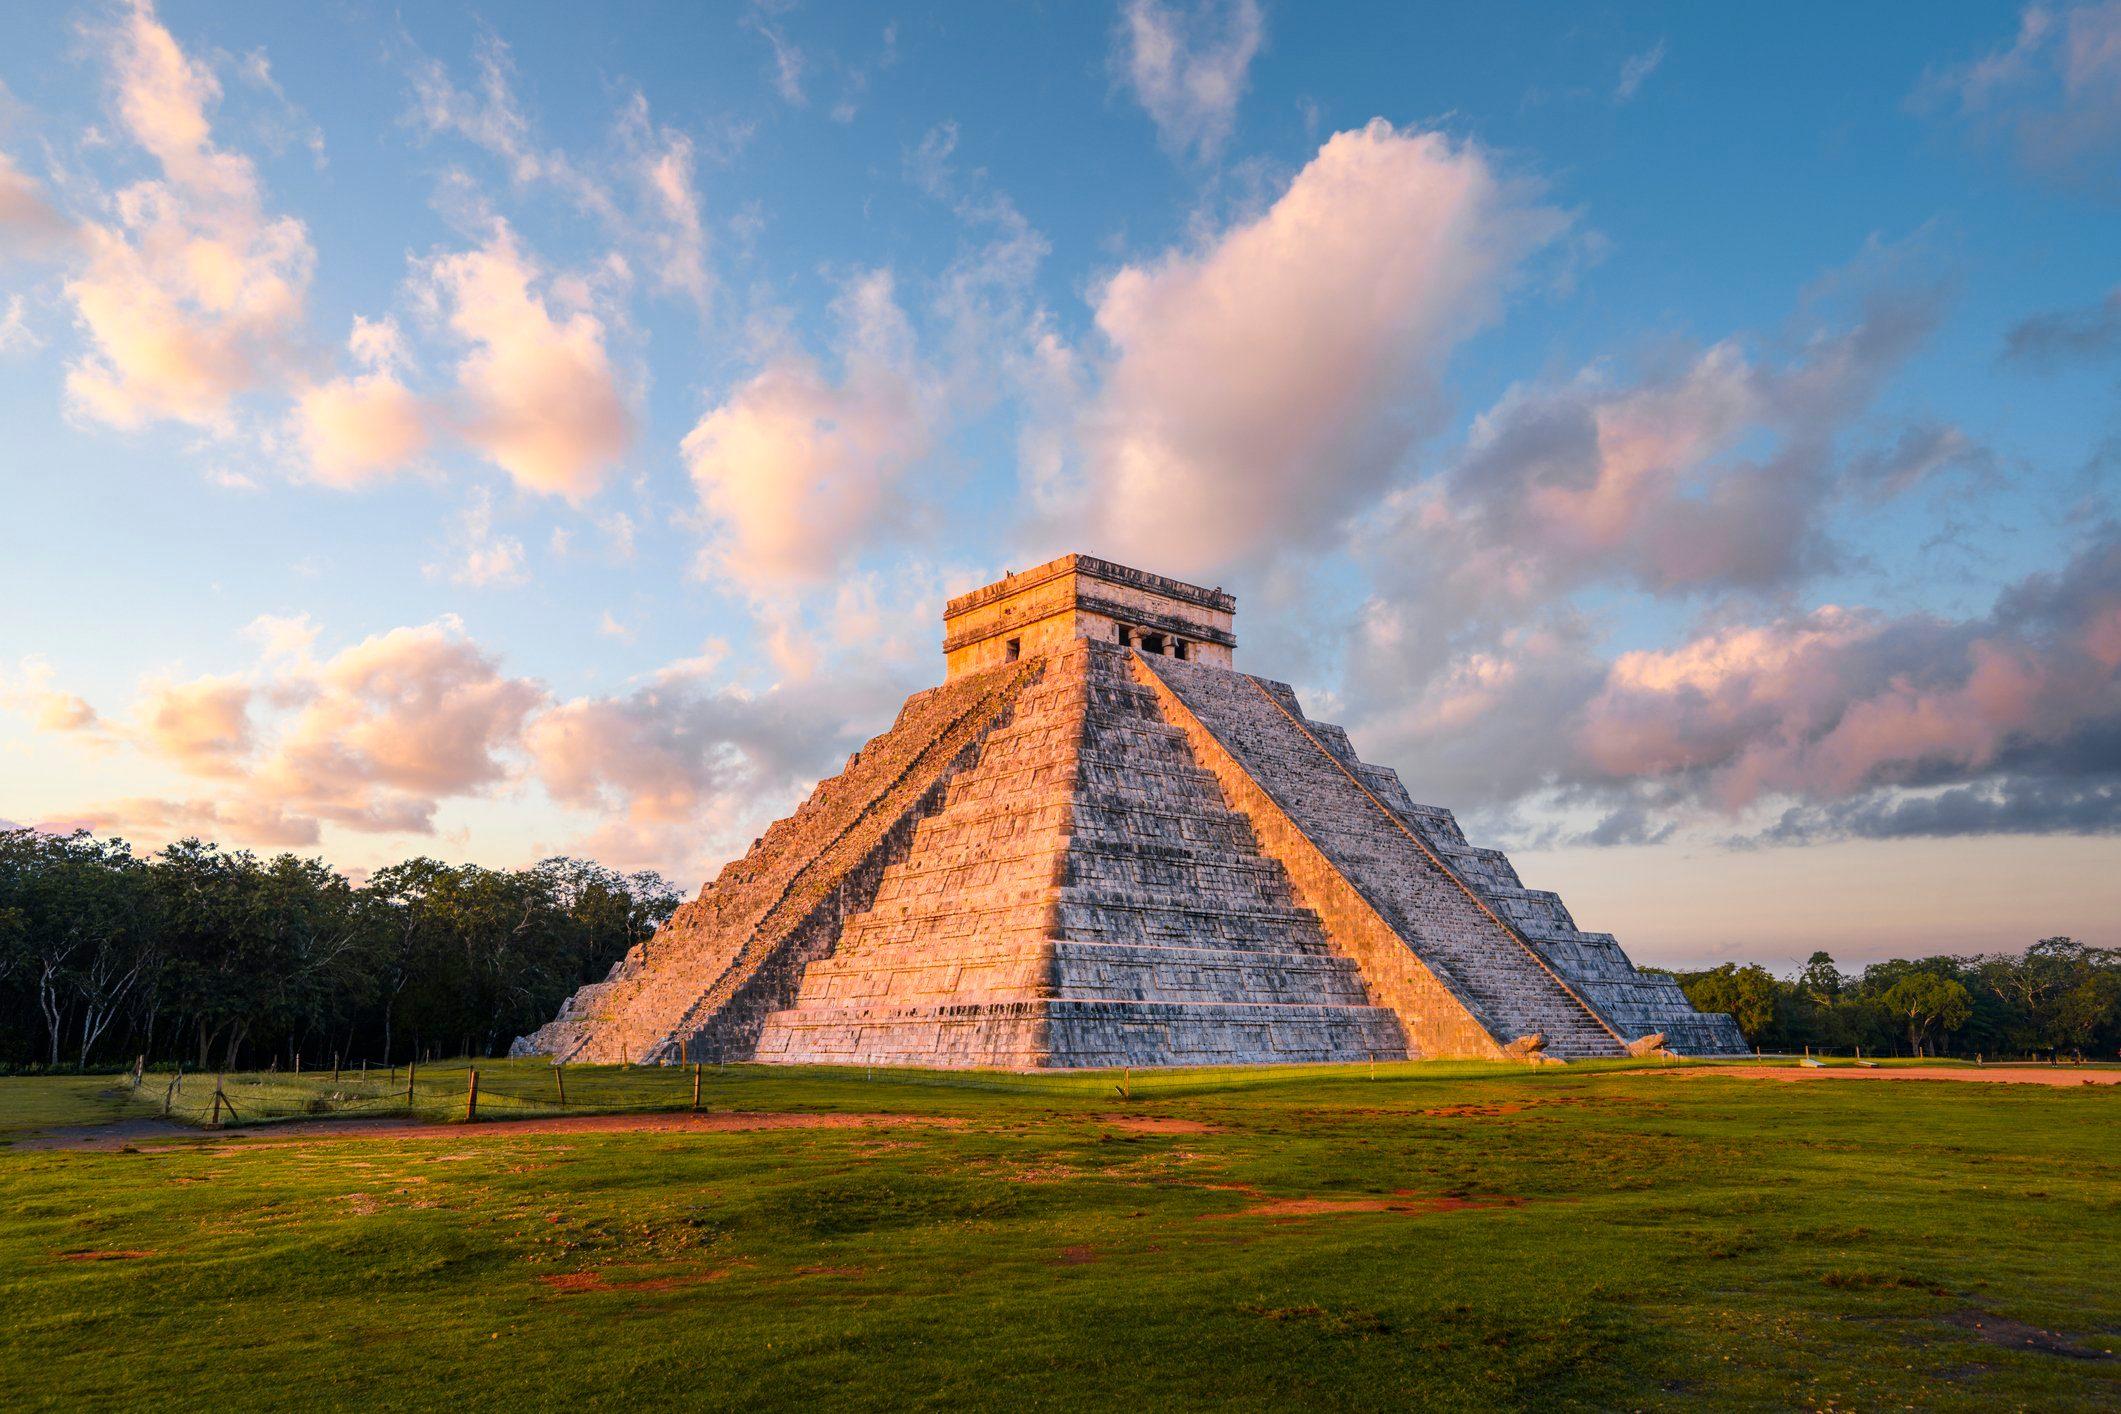 Kukulkan pyramid at Chichen-Itza archaeological site, Yucatan, Mexico